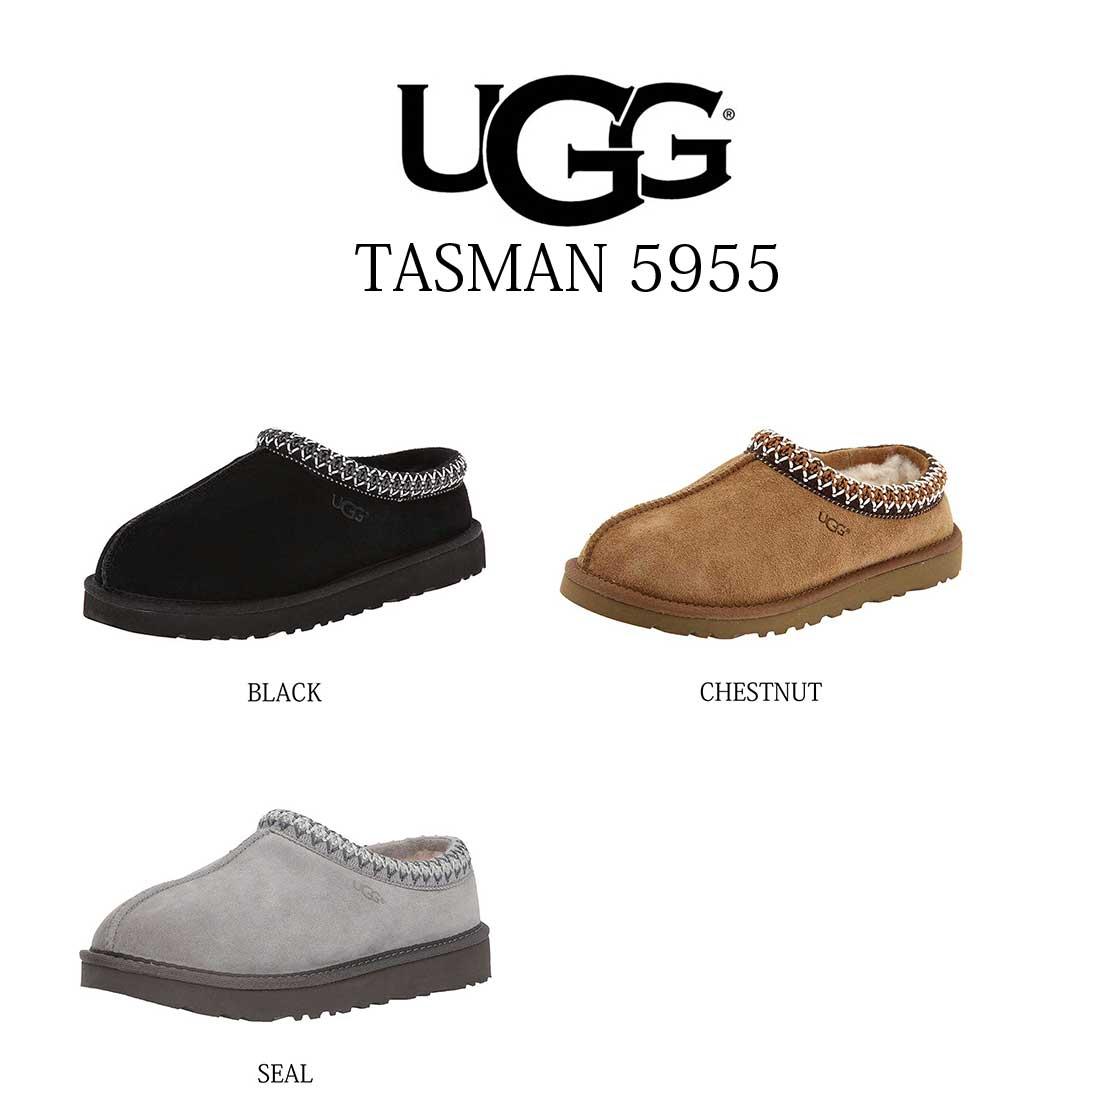 (SALE)UGG(アグ)ウィメンズ ムートン サンダル タスマン TASMAN 5955